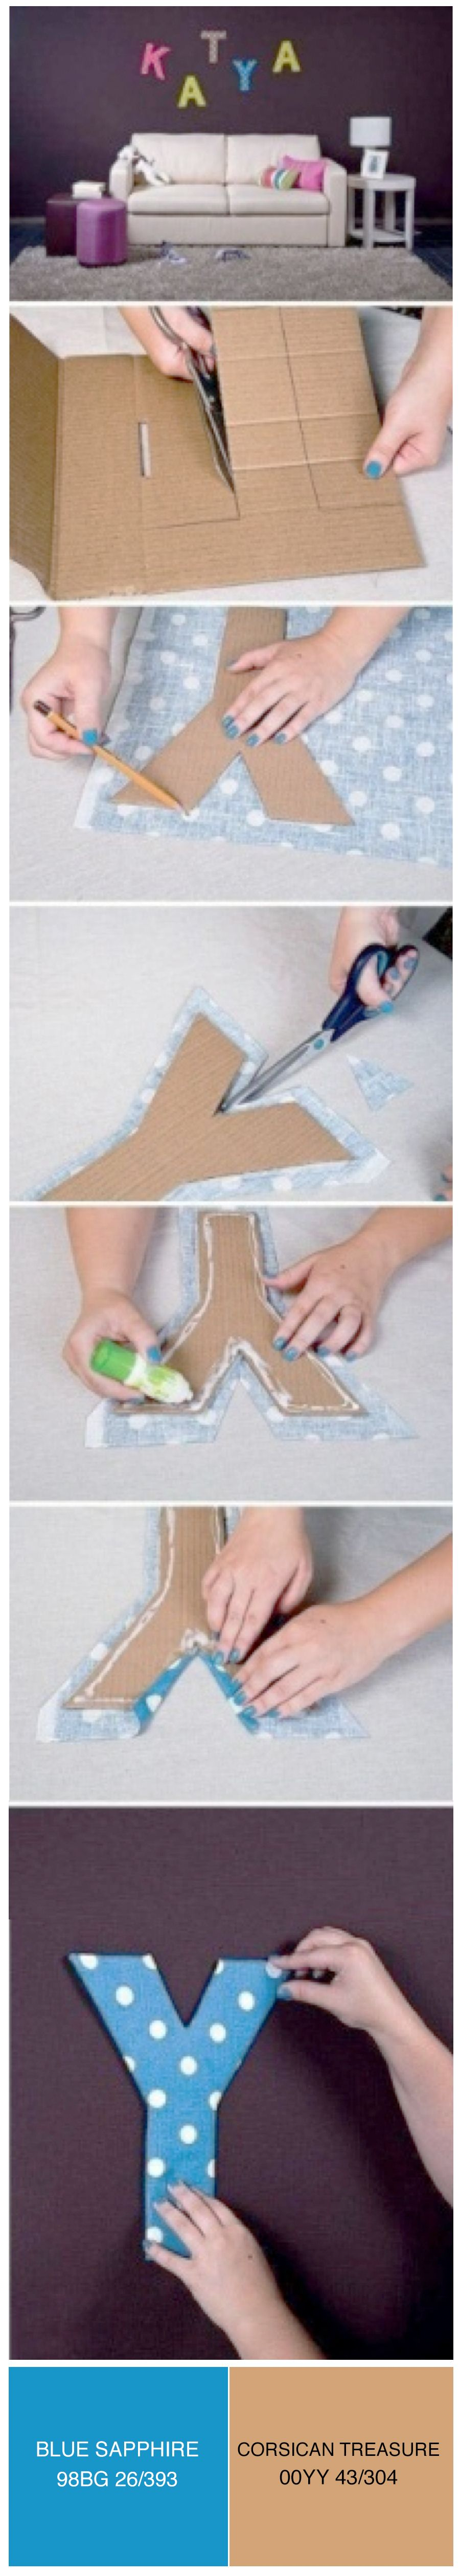 Cara Membuat Hiasan Dinding Dari Kertas Origami Yang Mudah